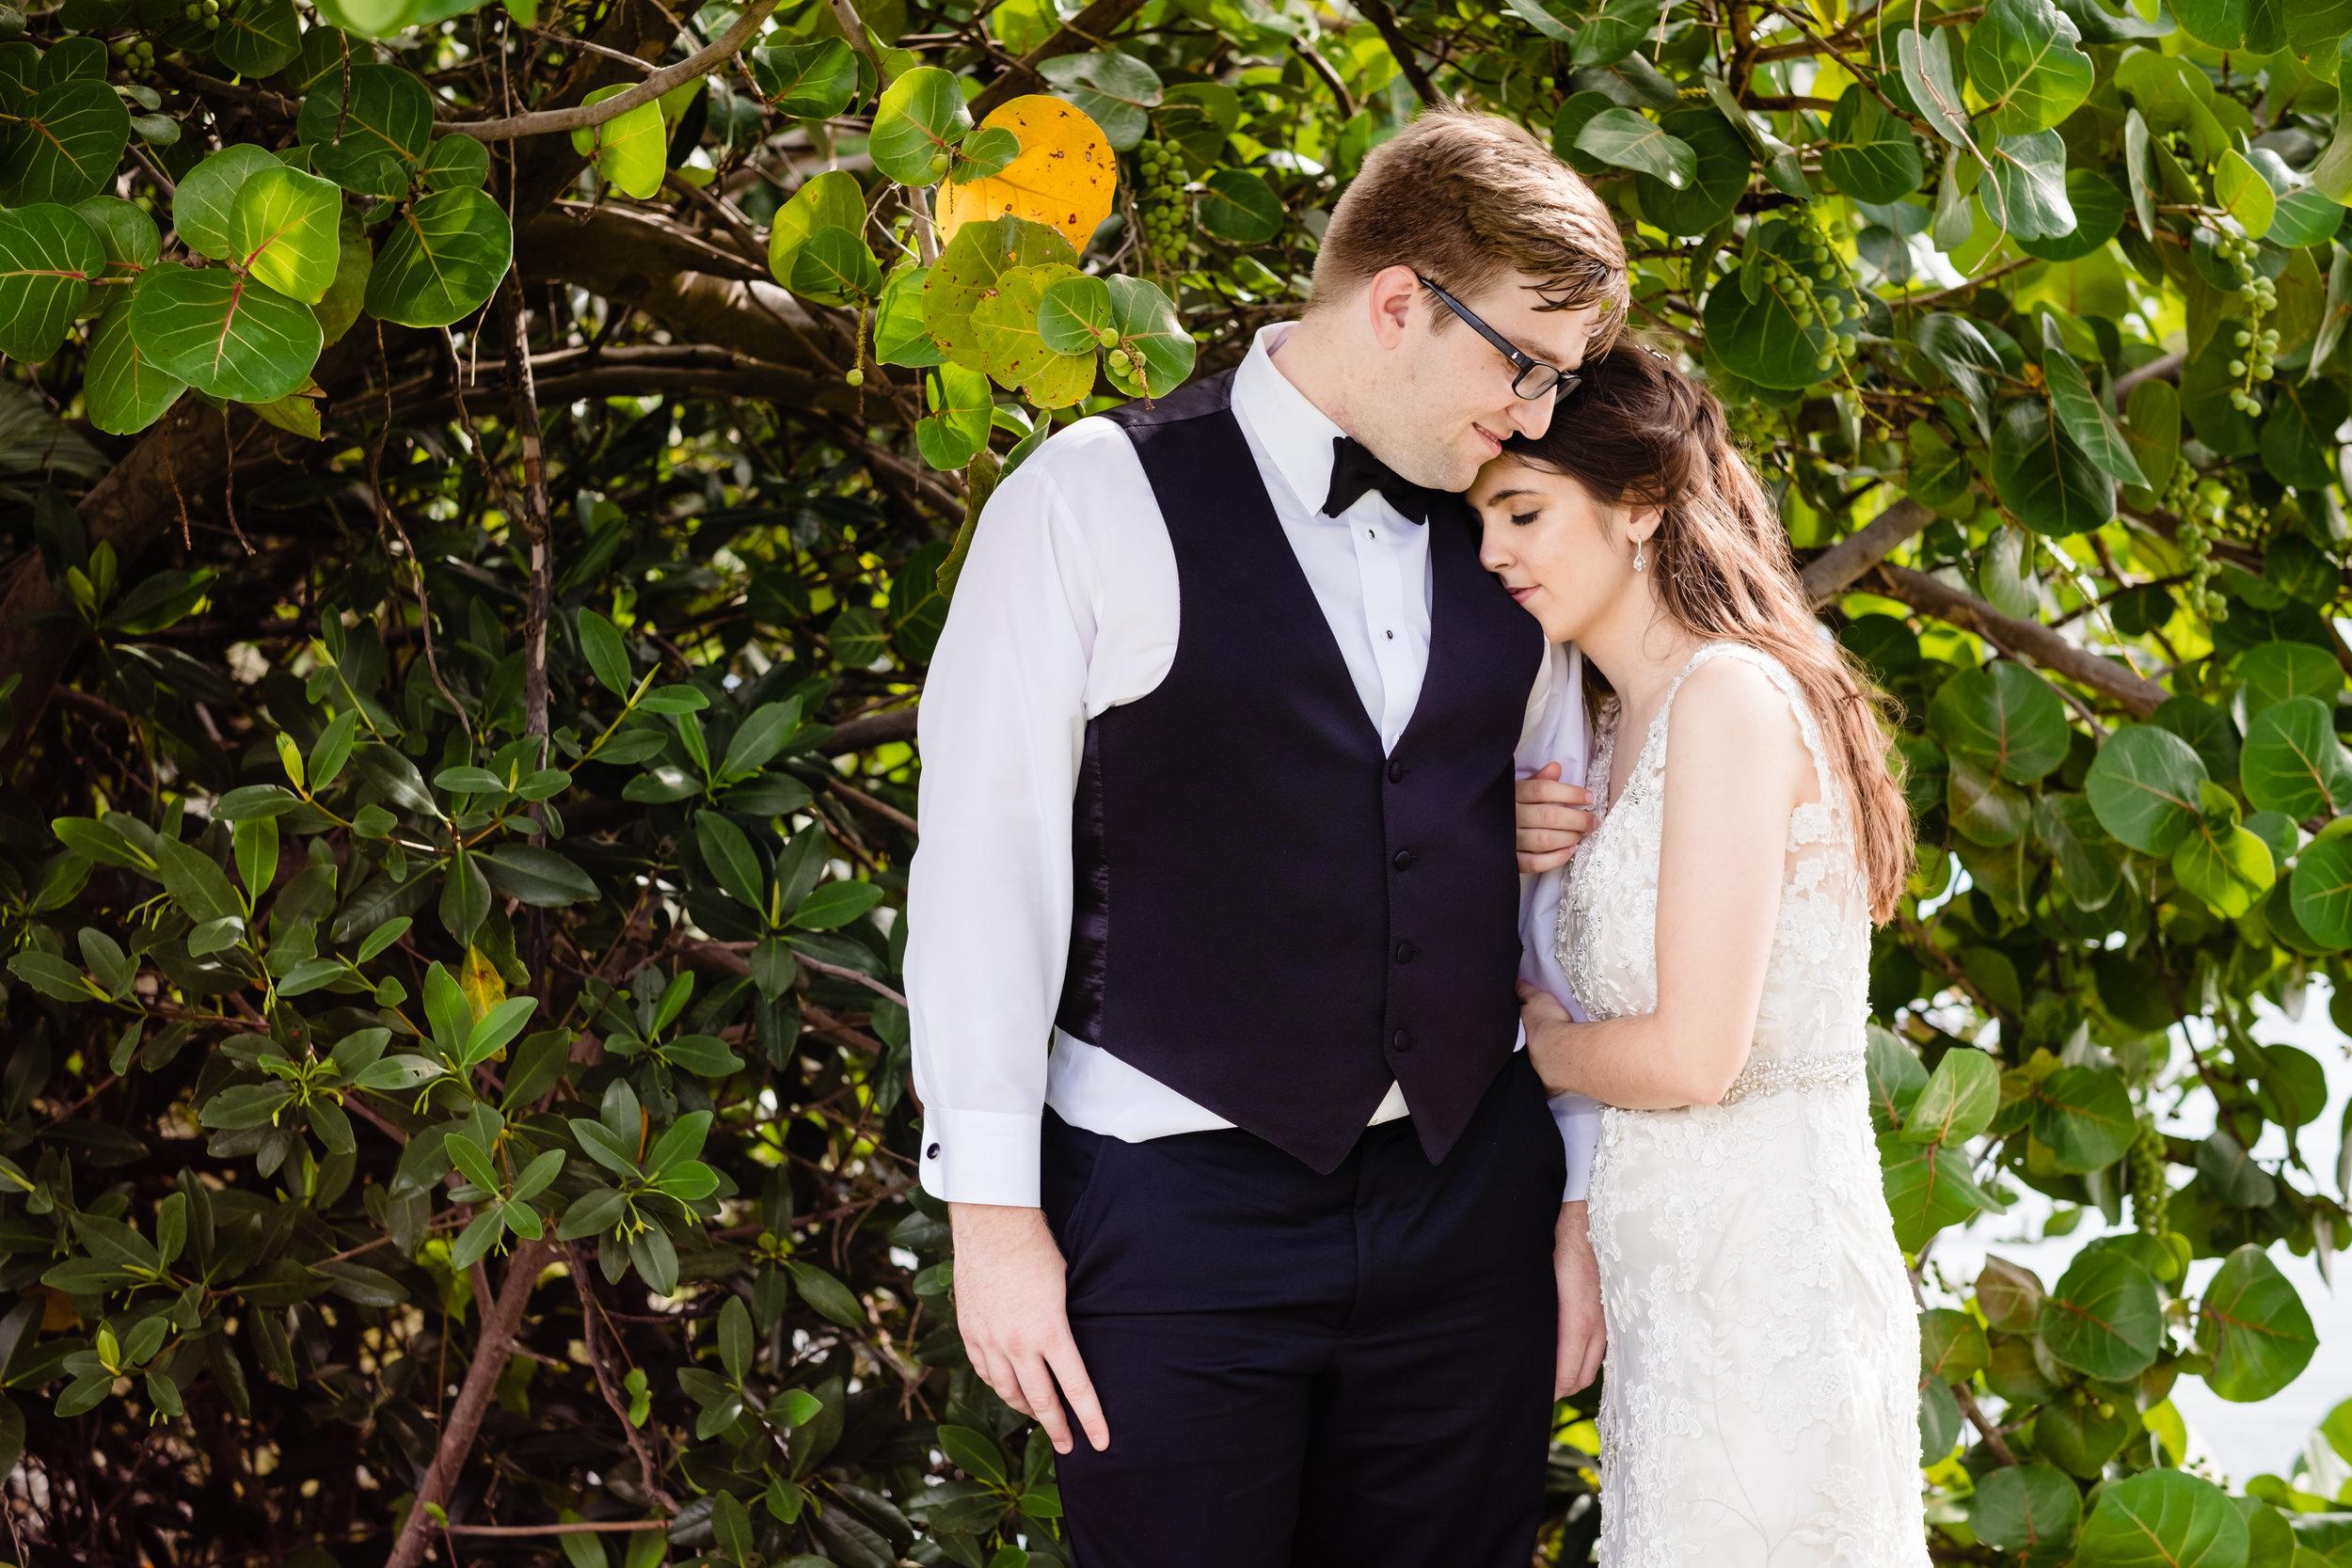 HAH_Zoe and Daniel_Clearwater Wedding_607_2018.jpg